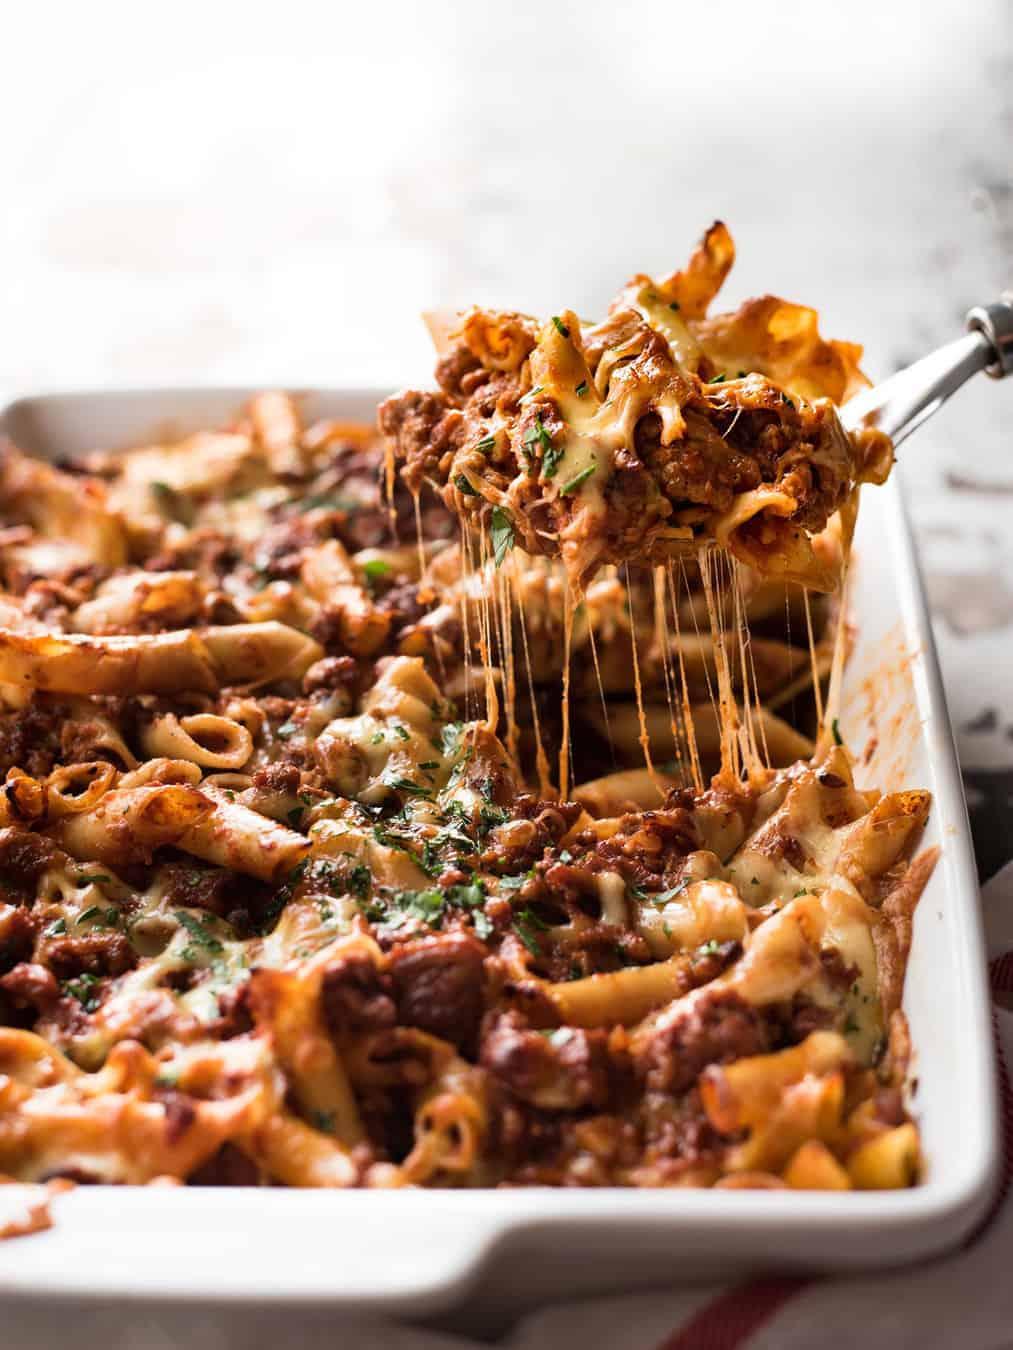 Italian Baked Ziti with Sausage | RecipeTin Eats